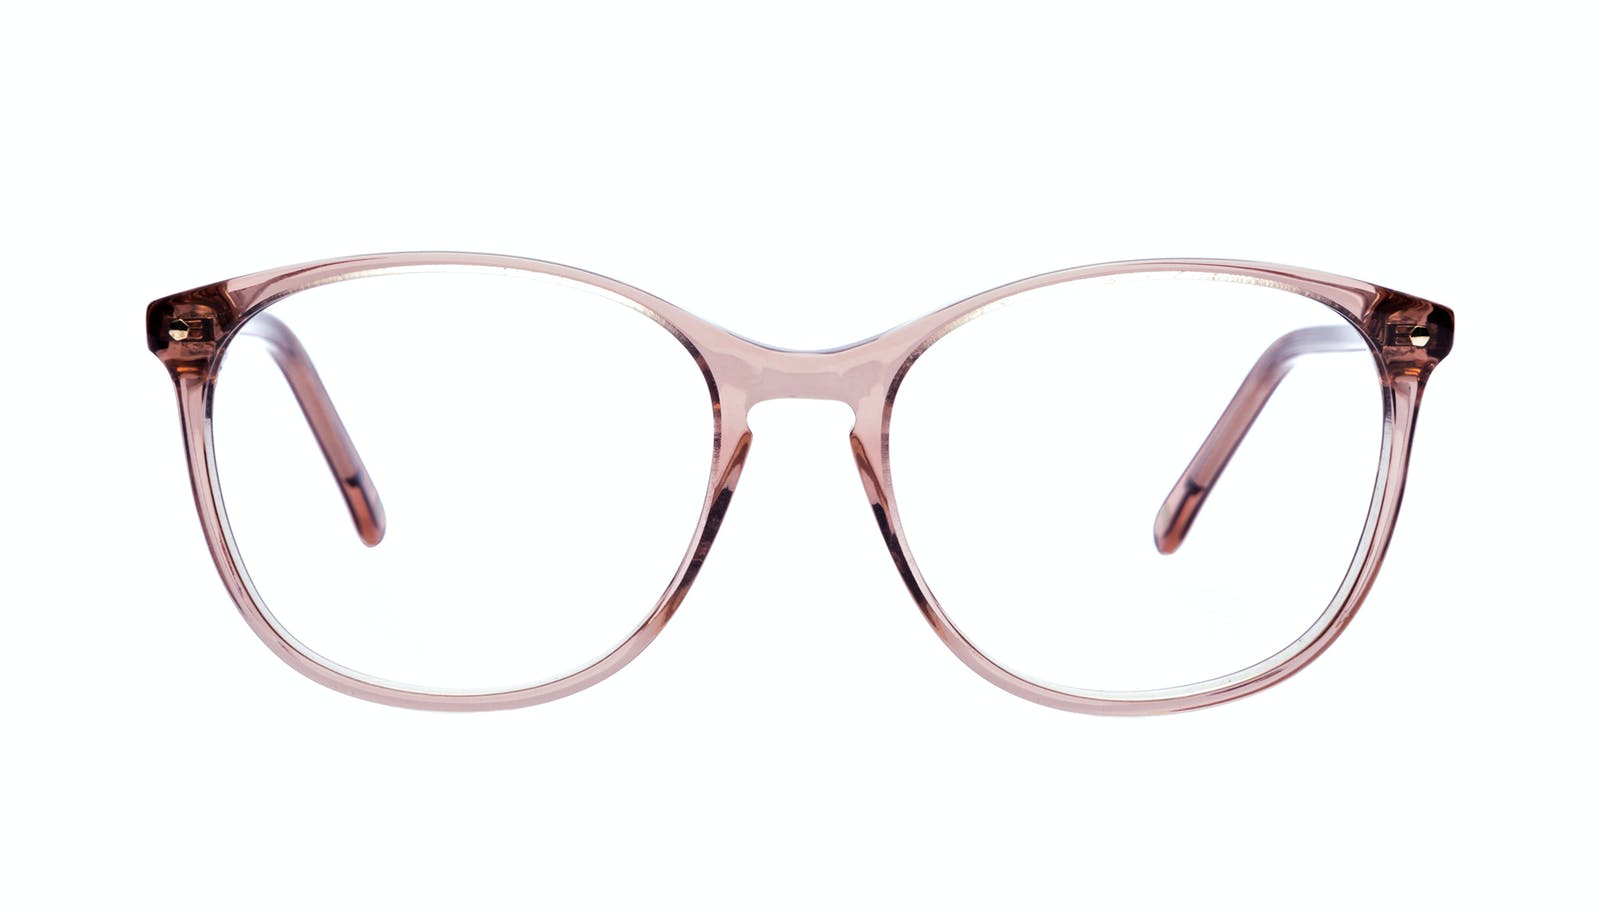 cbbb3886fb5380 Affordable Fashion Glasses Rectangle Square Round Eyeglasses Women Nadine  Rose